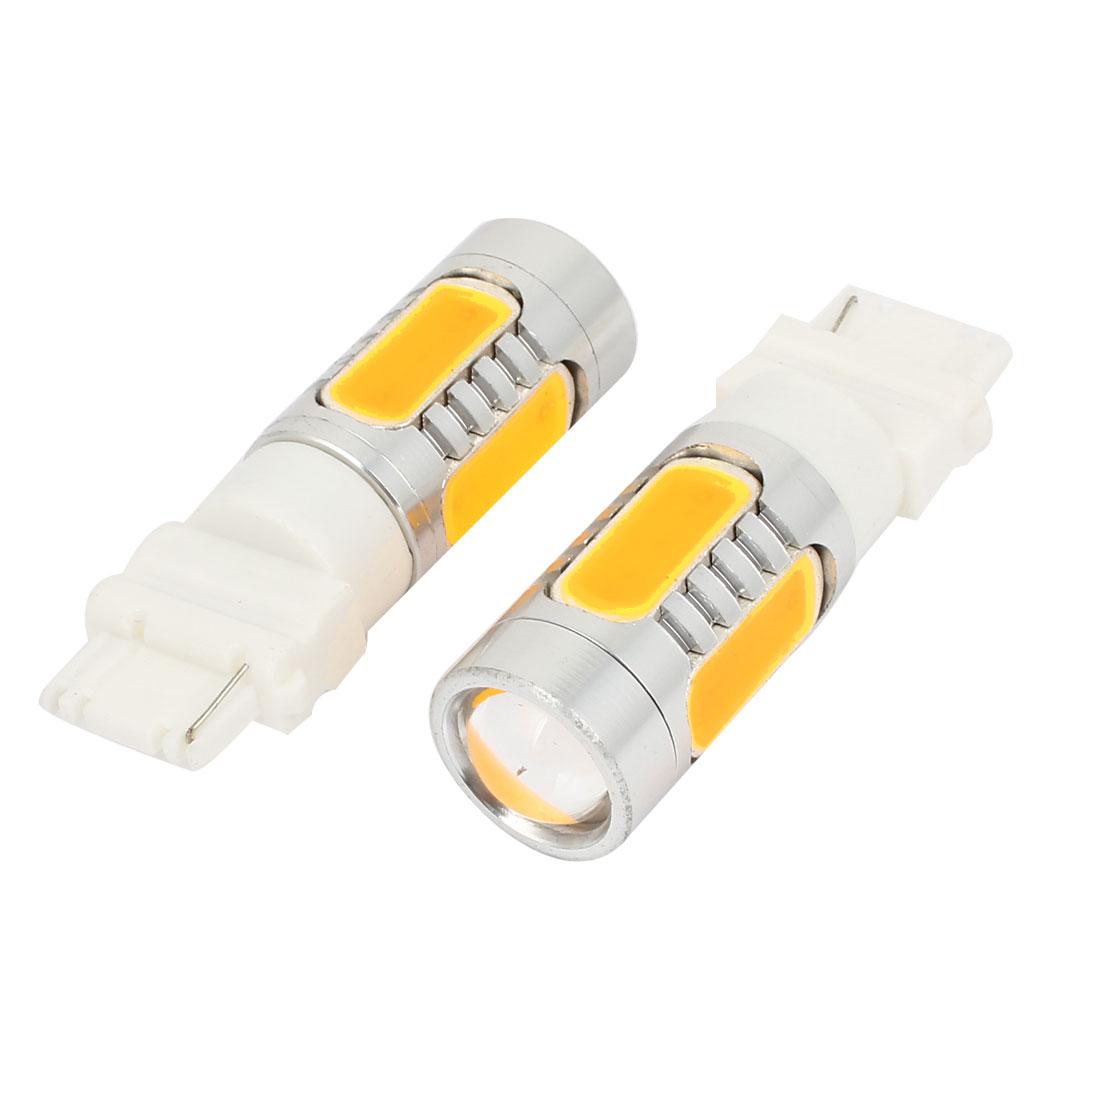 Pair 3156 7.5W Yellow SMD LED Car Reverse Brake Signal Lamp Tail Light Bulb 12V